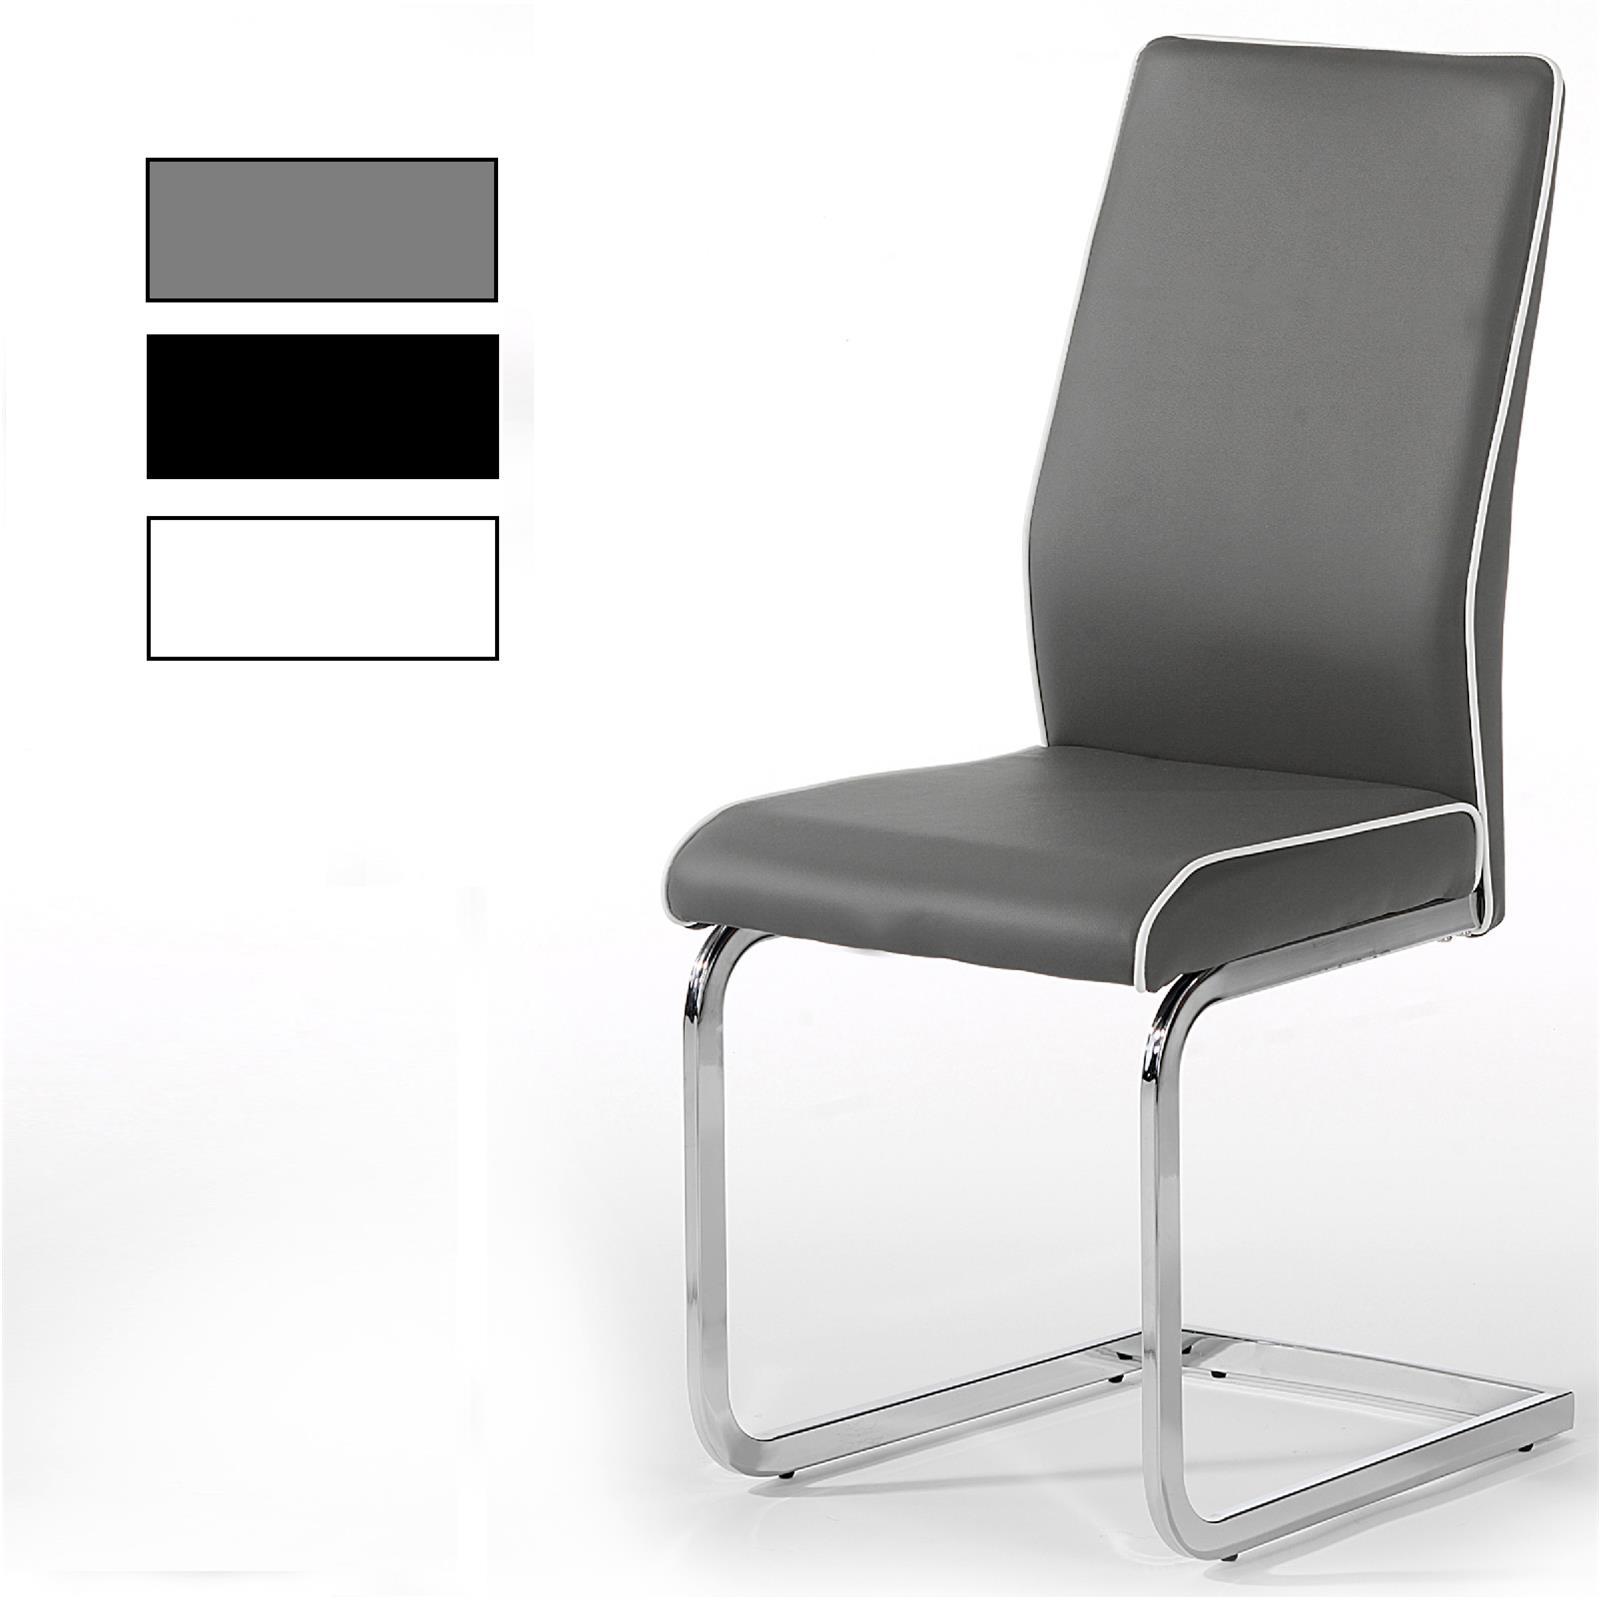 4er set schwingstuhl merle 3 farbvarianten caro m bel for Farbvarianten wohnzimmer